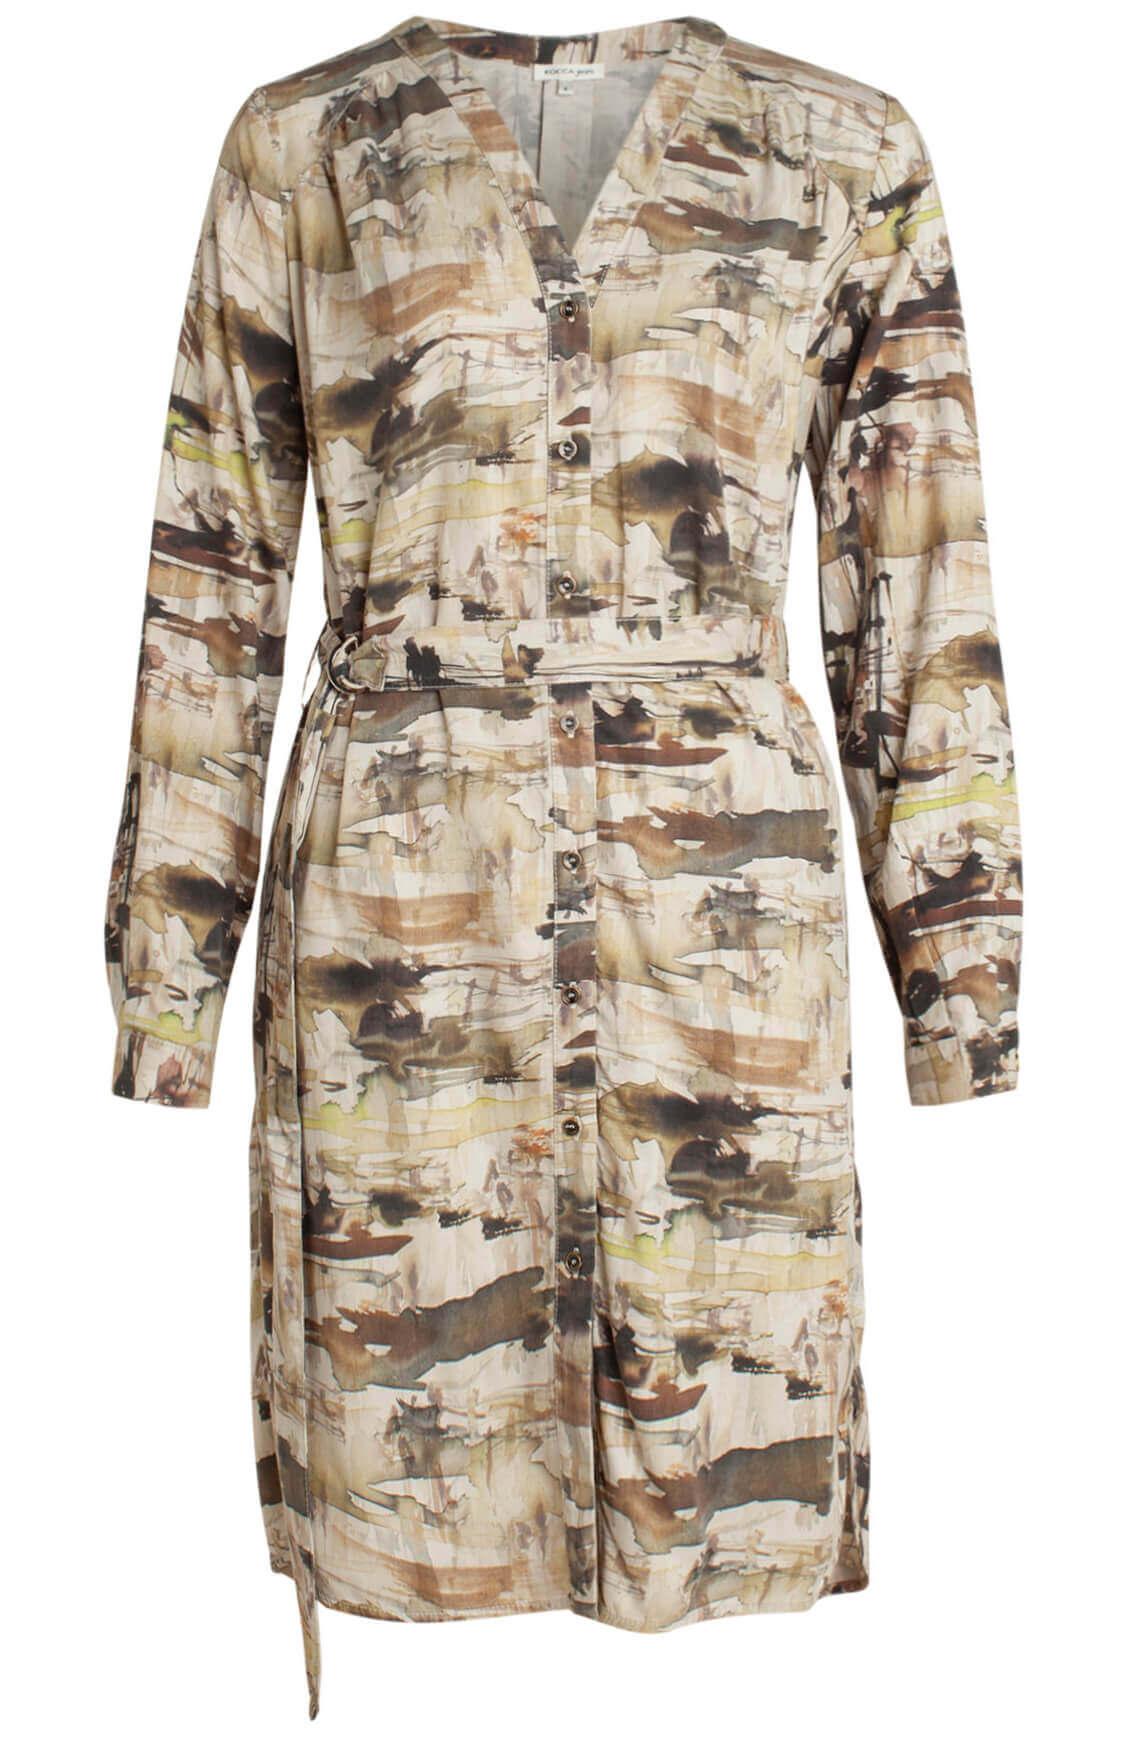 Kocca Dames Ardit jurk groen